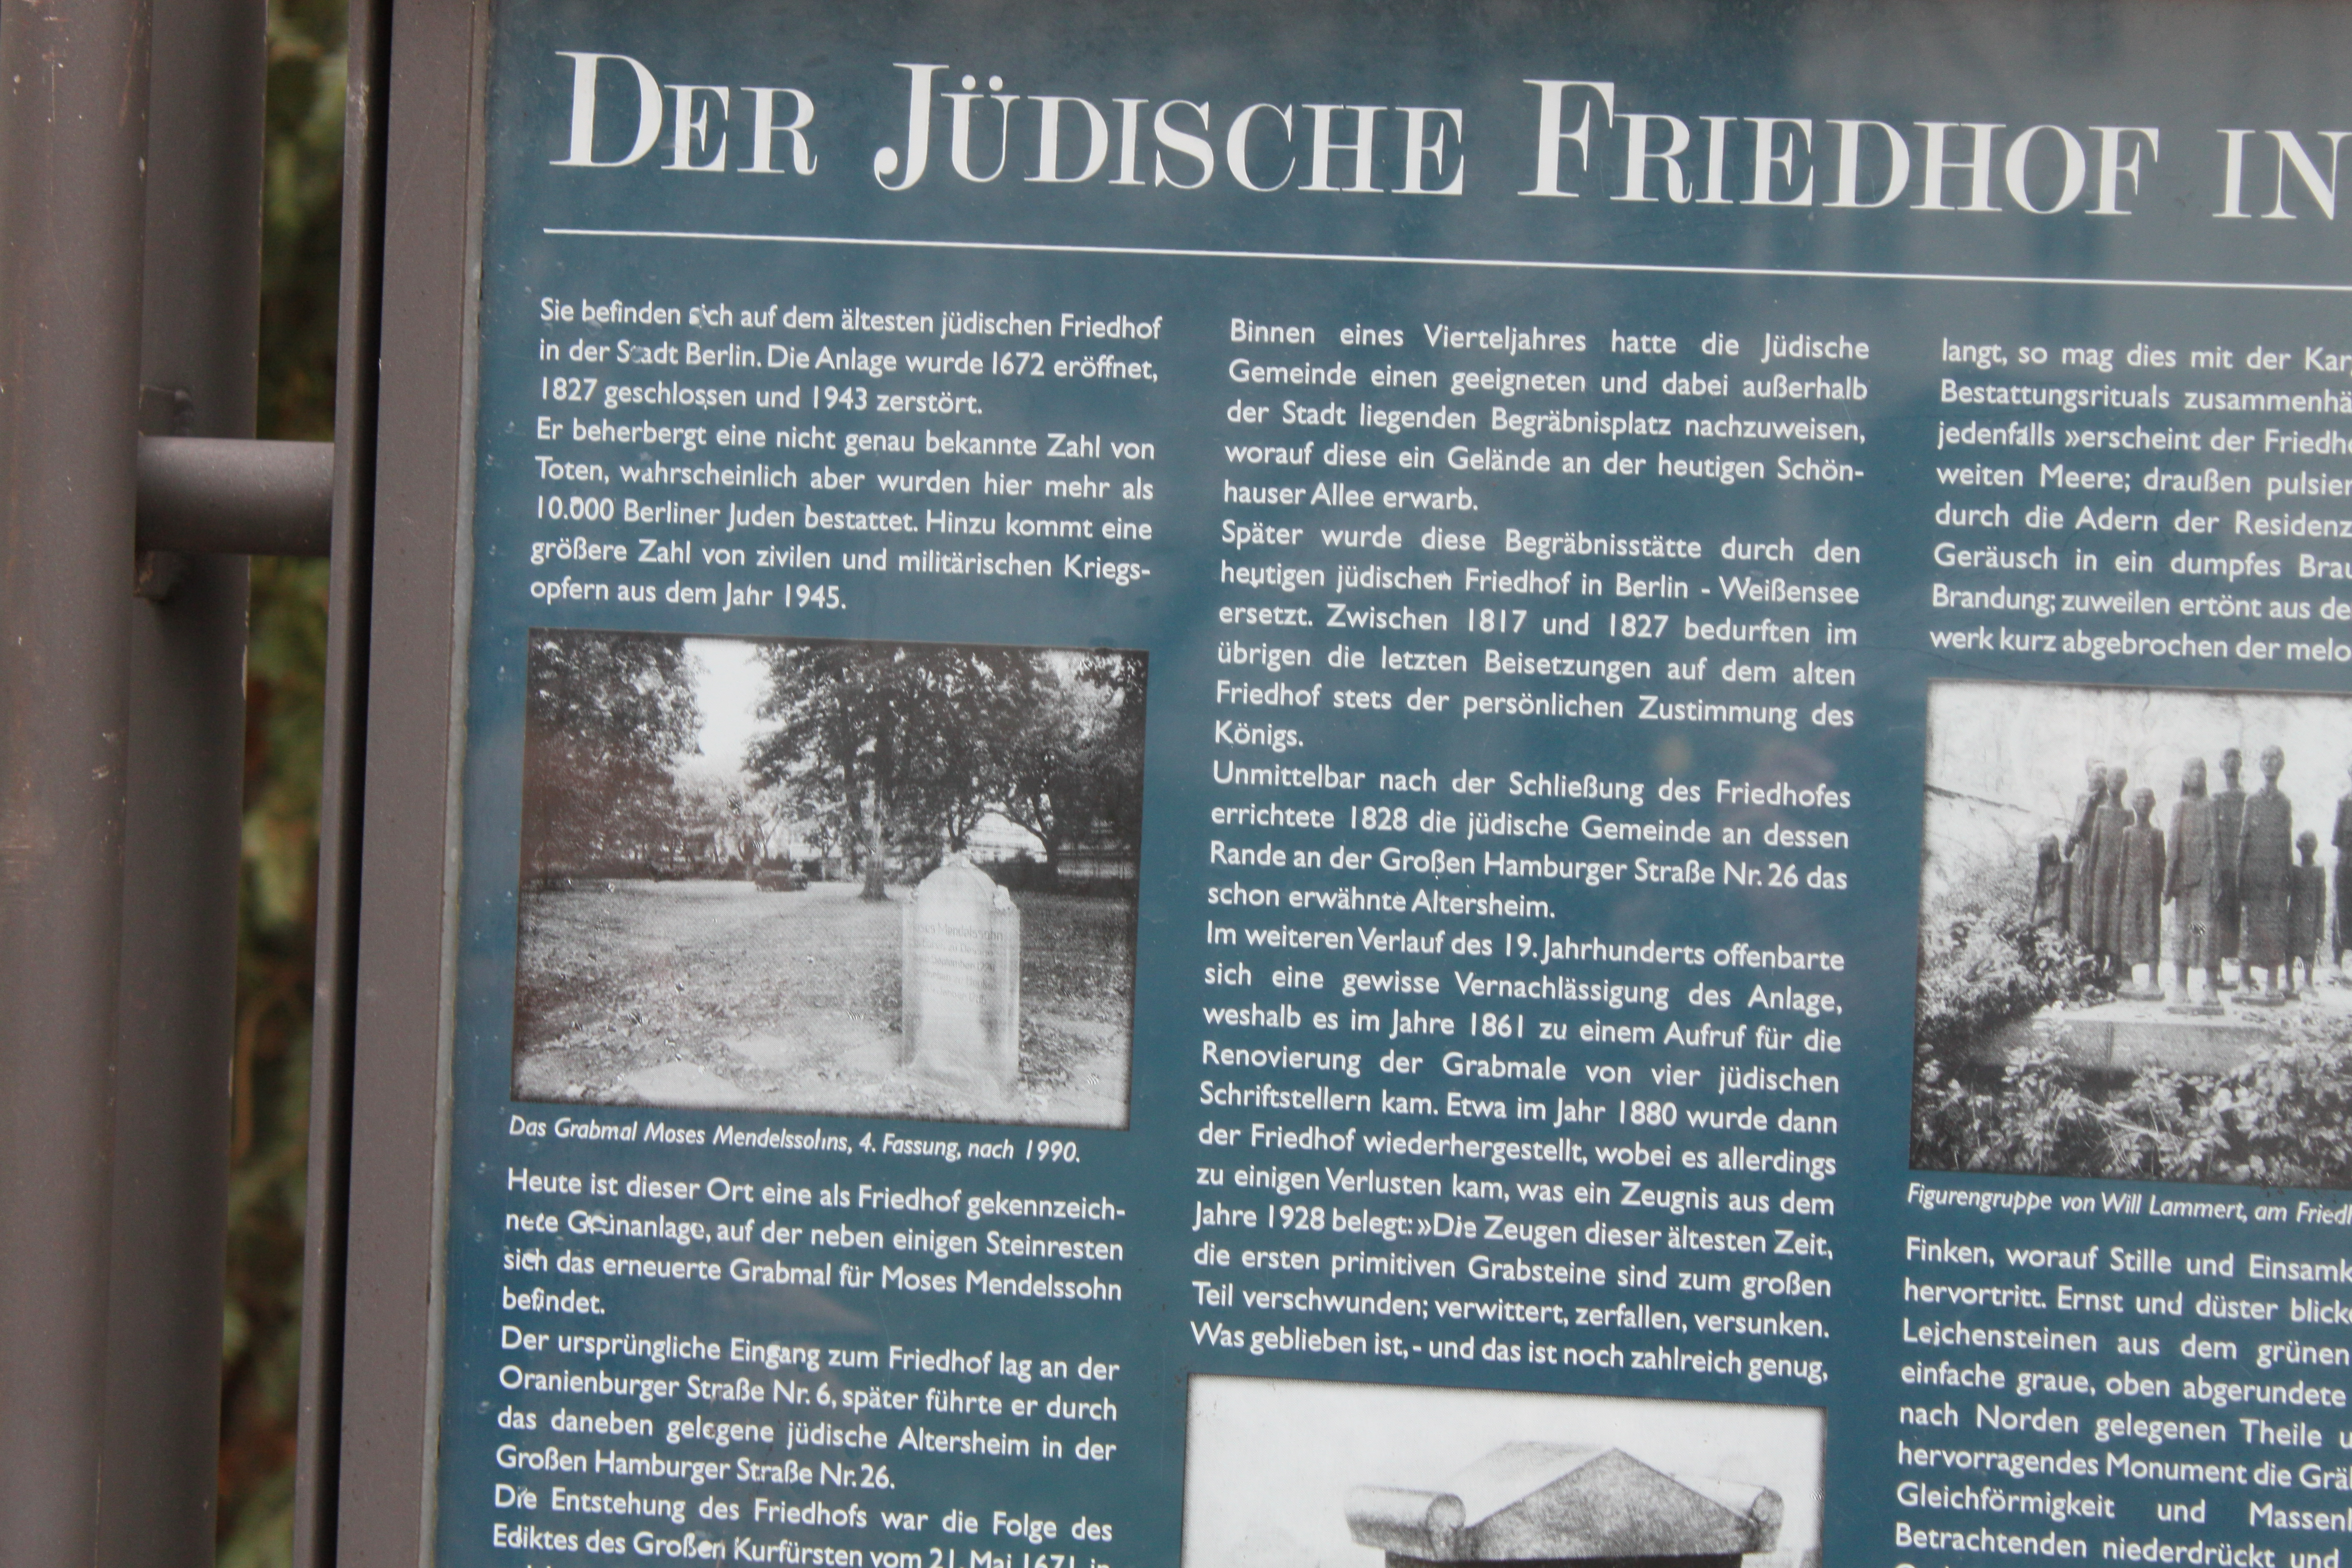 85baeb8eaa17a7 File Jüdischer Friedhof Berlin Mitte 2011 PD 14.JPG - Wikimedia Commons